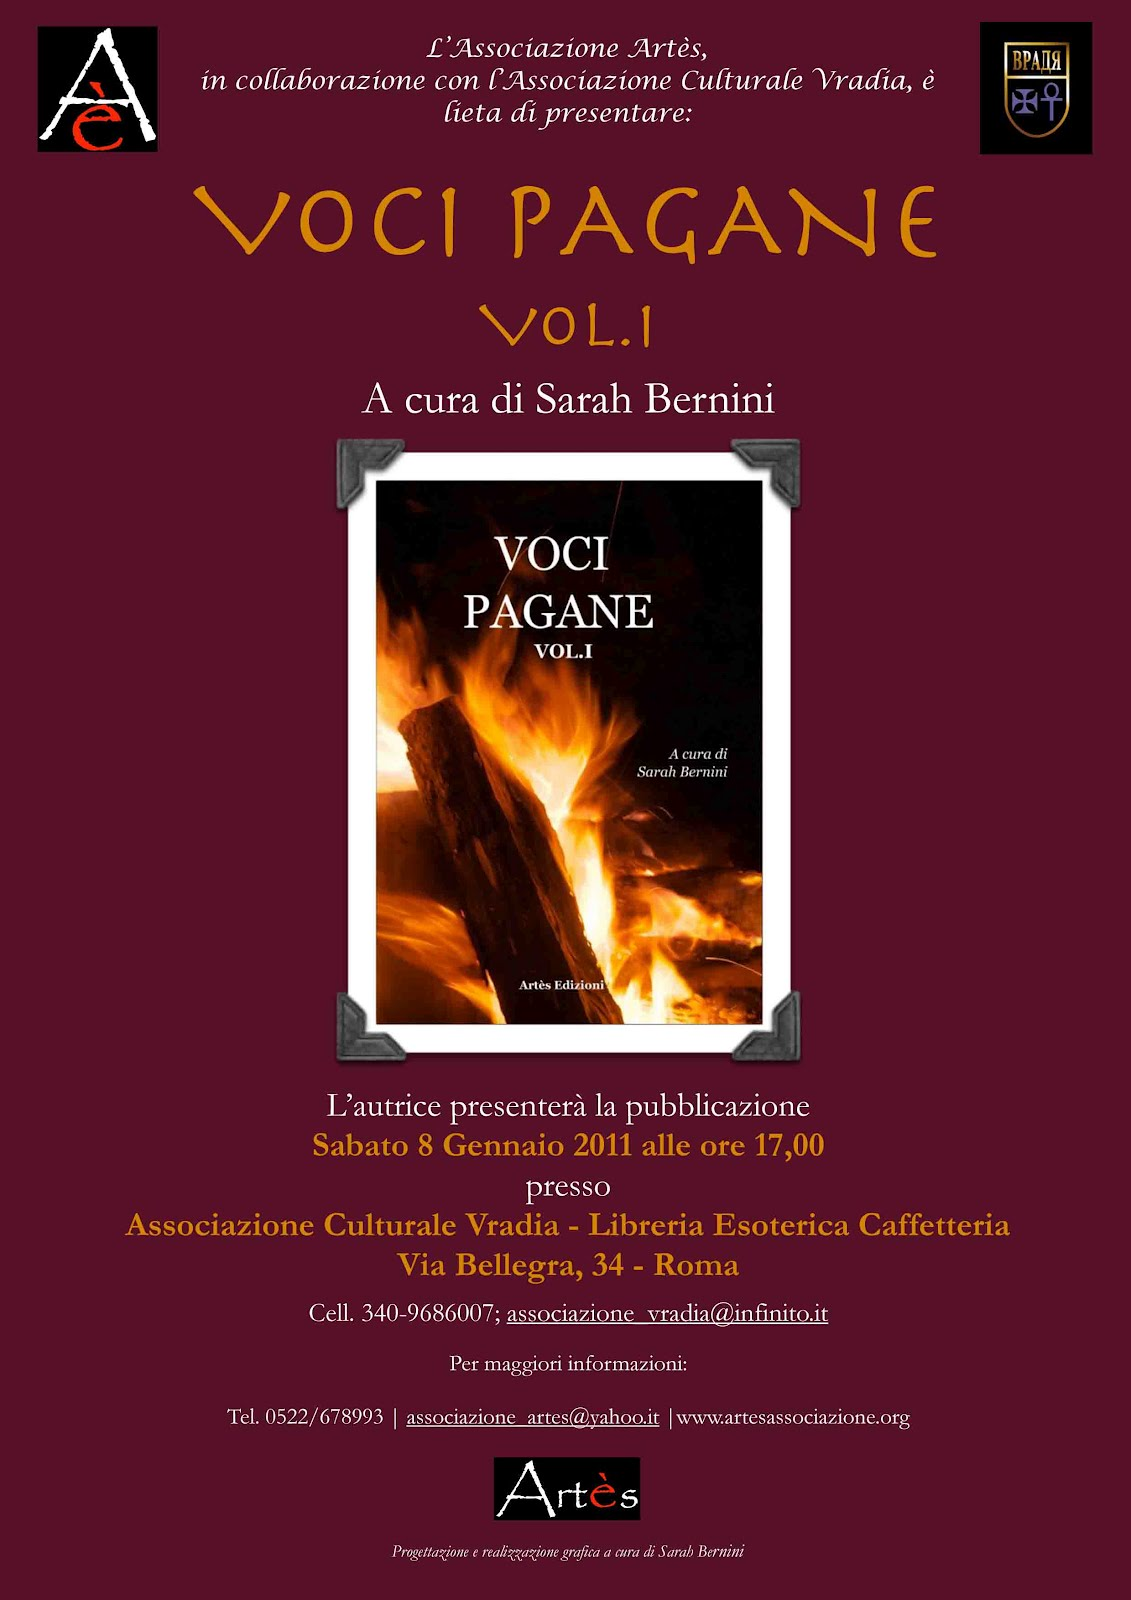 Locandina presentazione Voci Pagane I